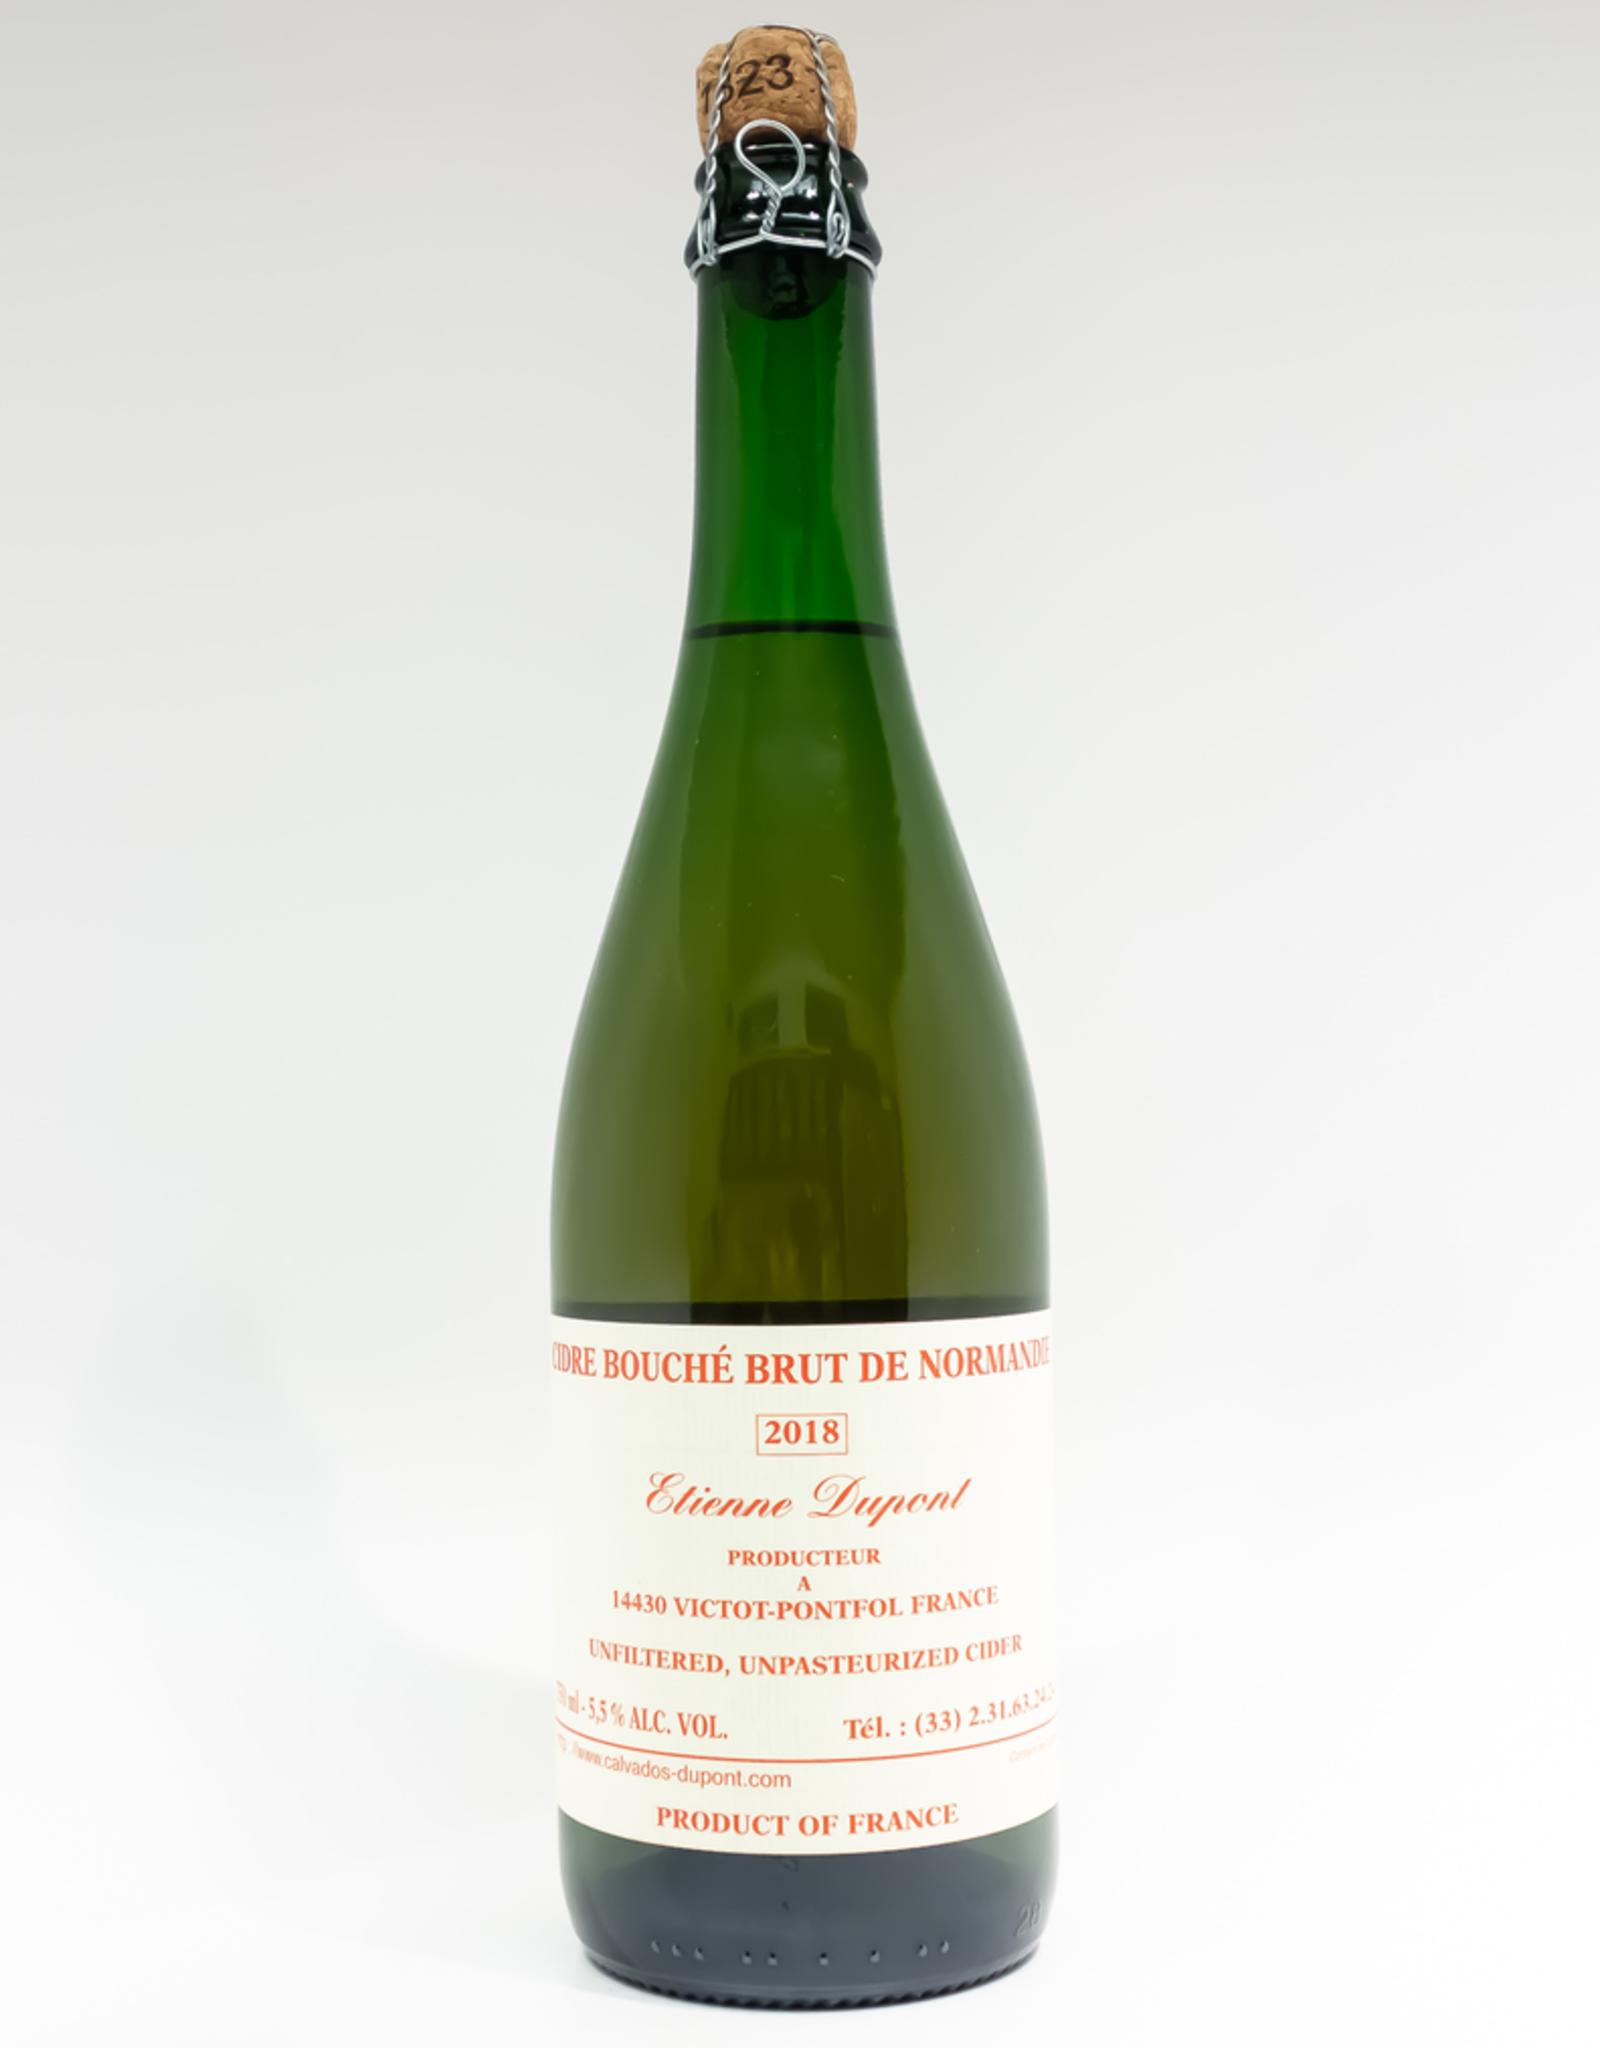 Cider-World-France Domaine Dupont Cidre Bouche 2018